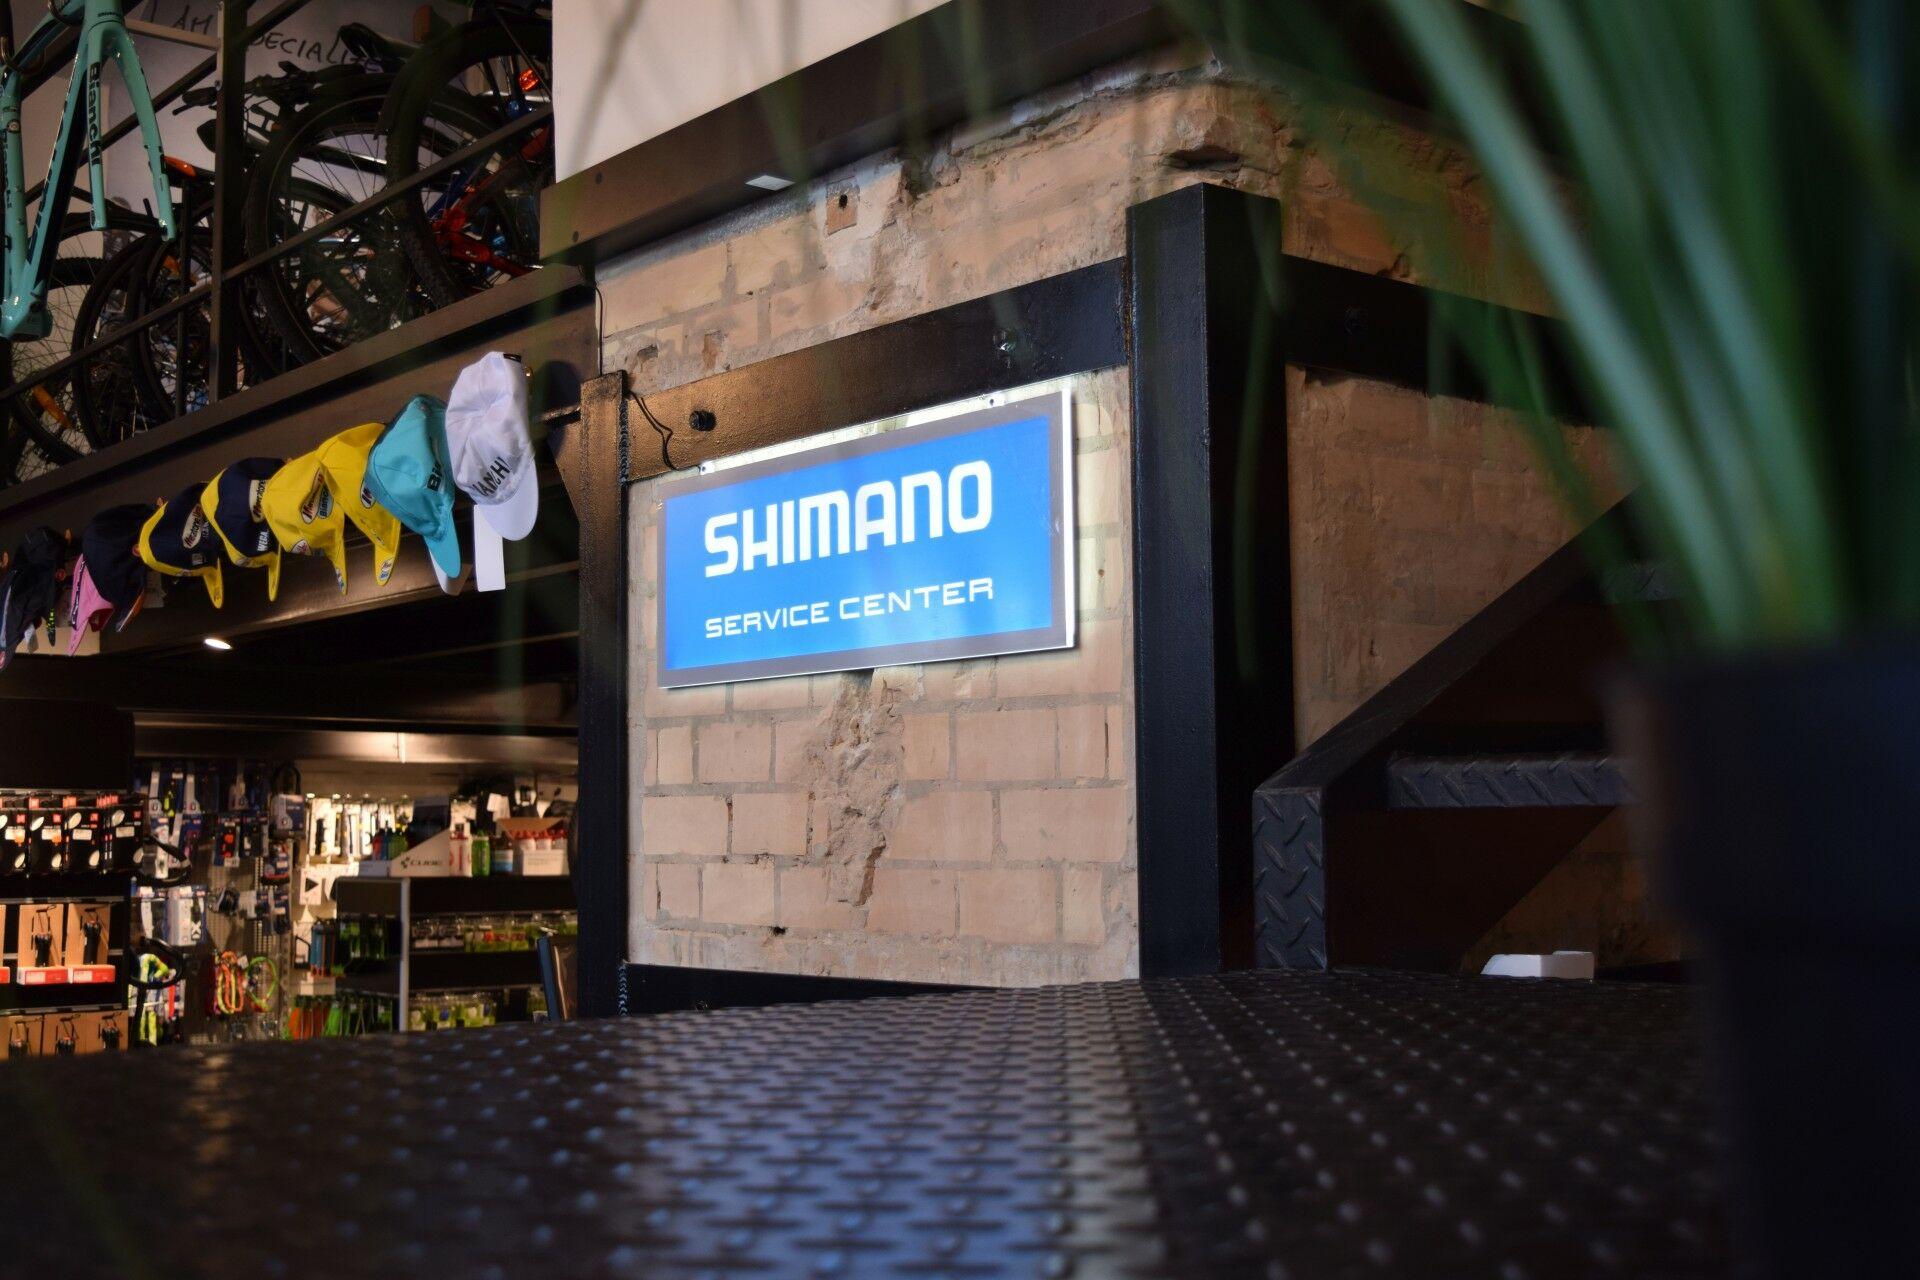 Shimano Service Center Budapest